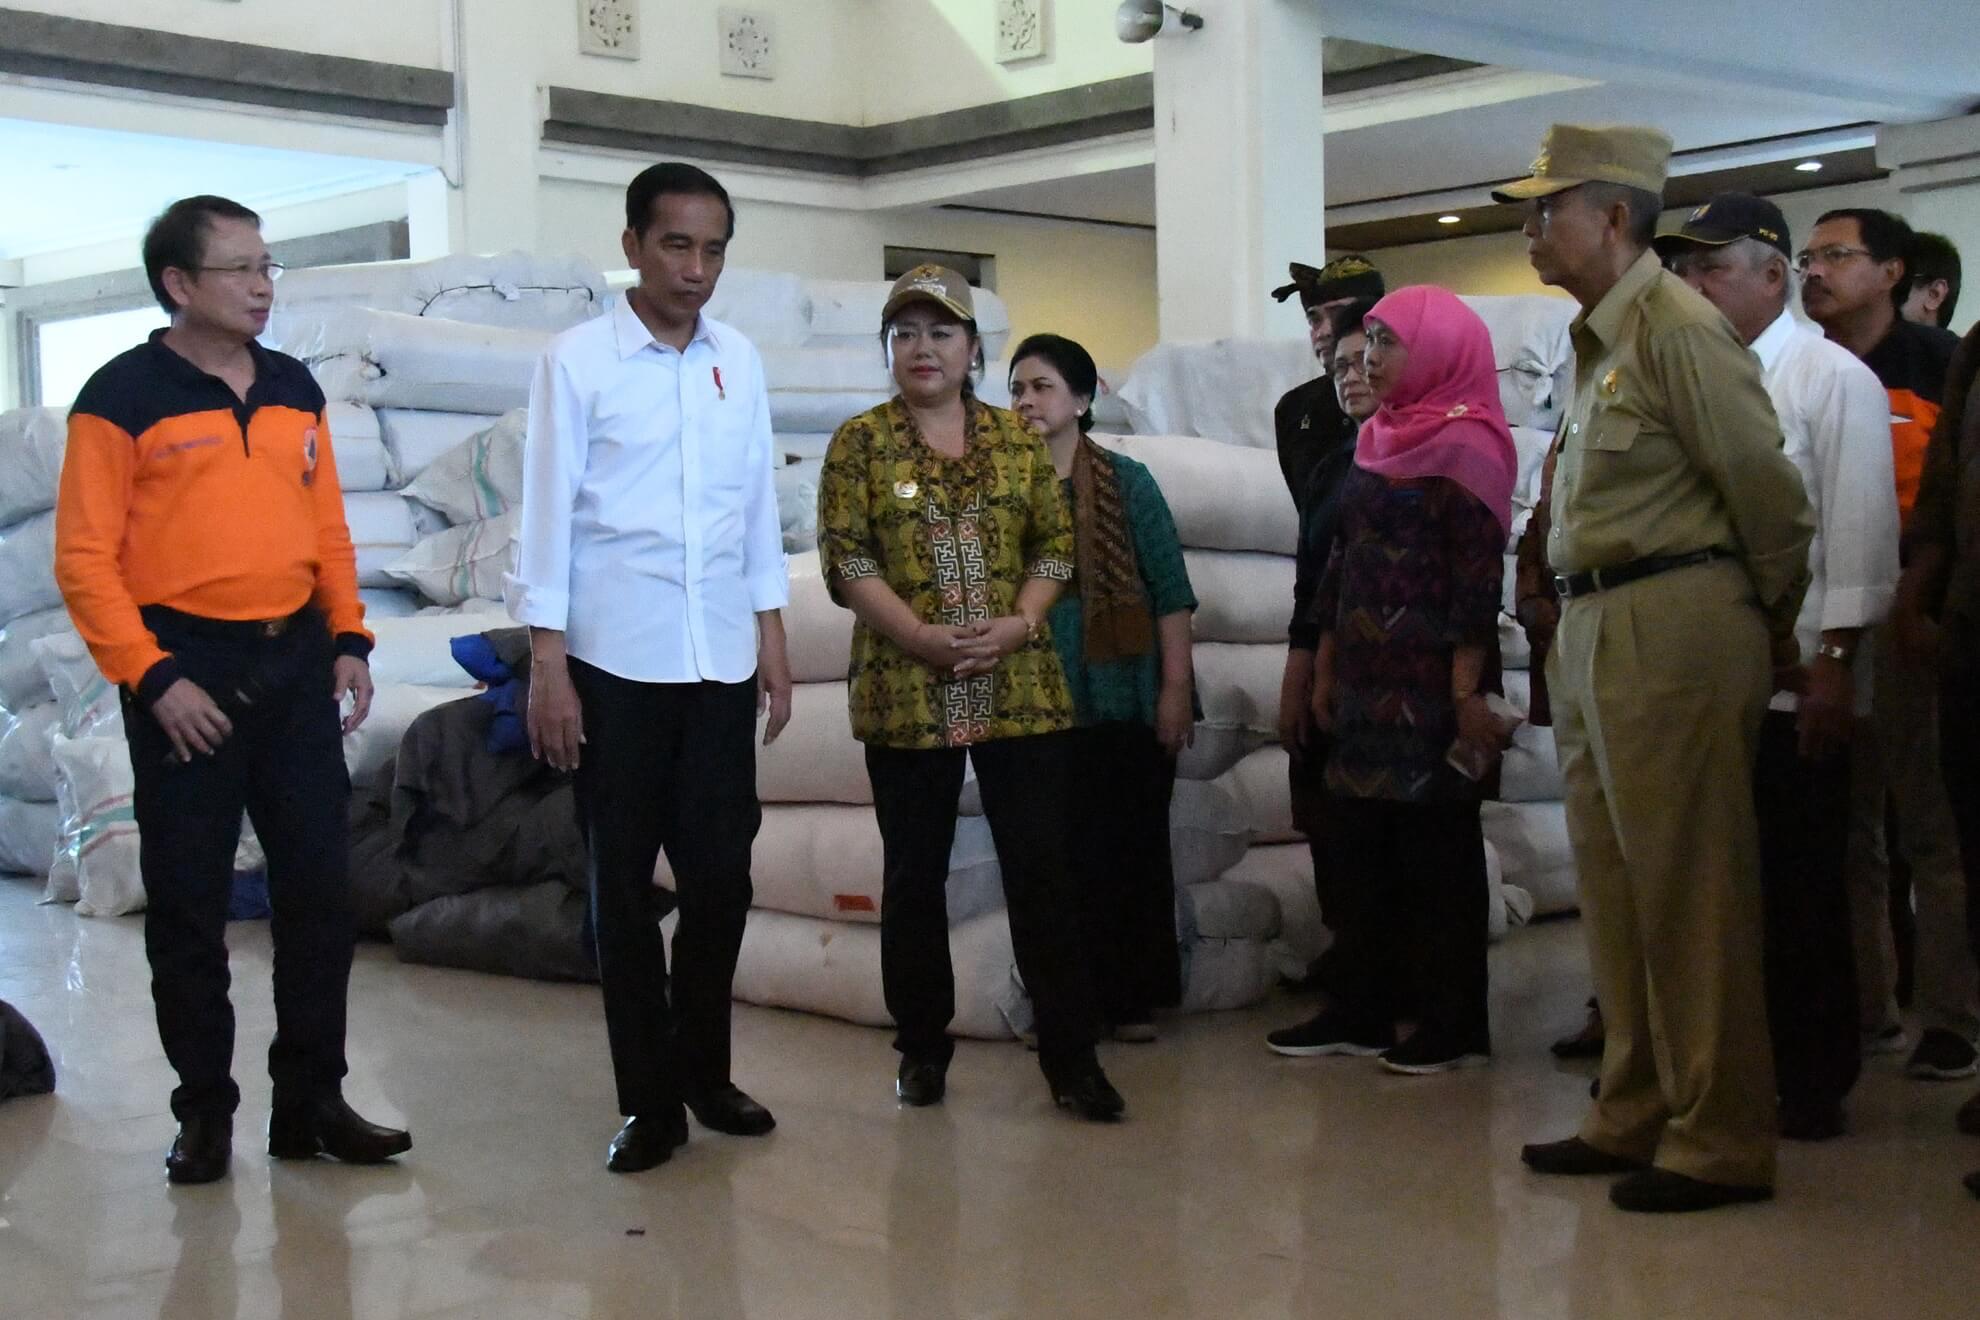 presiden-jokowi-dan-kabinet-kerja-meninjau-kesiapan-logistik-di-pos-komando-bencana-gunung-agung-desa-karangasem-jpg-2